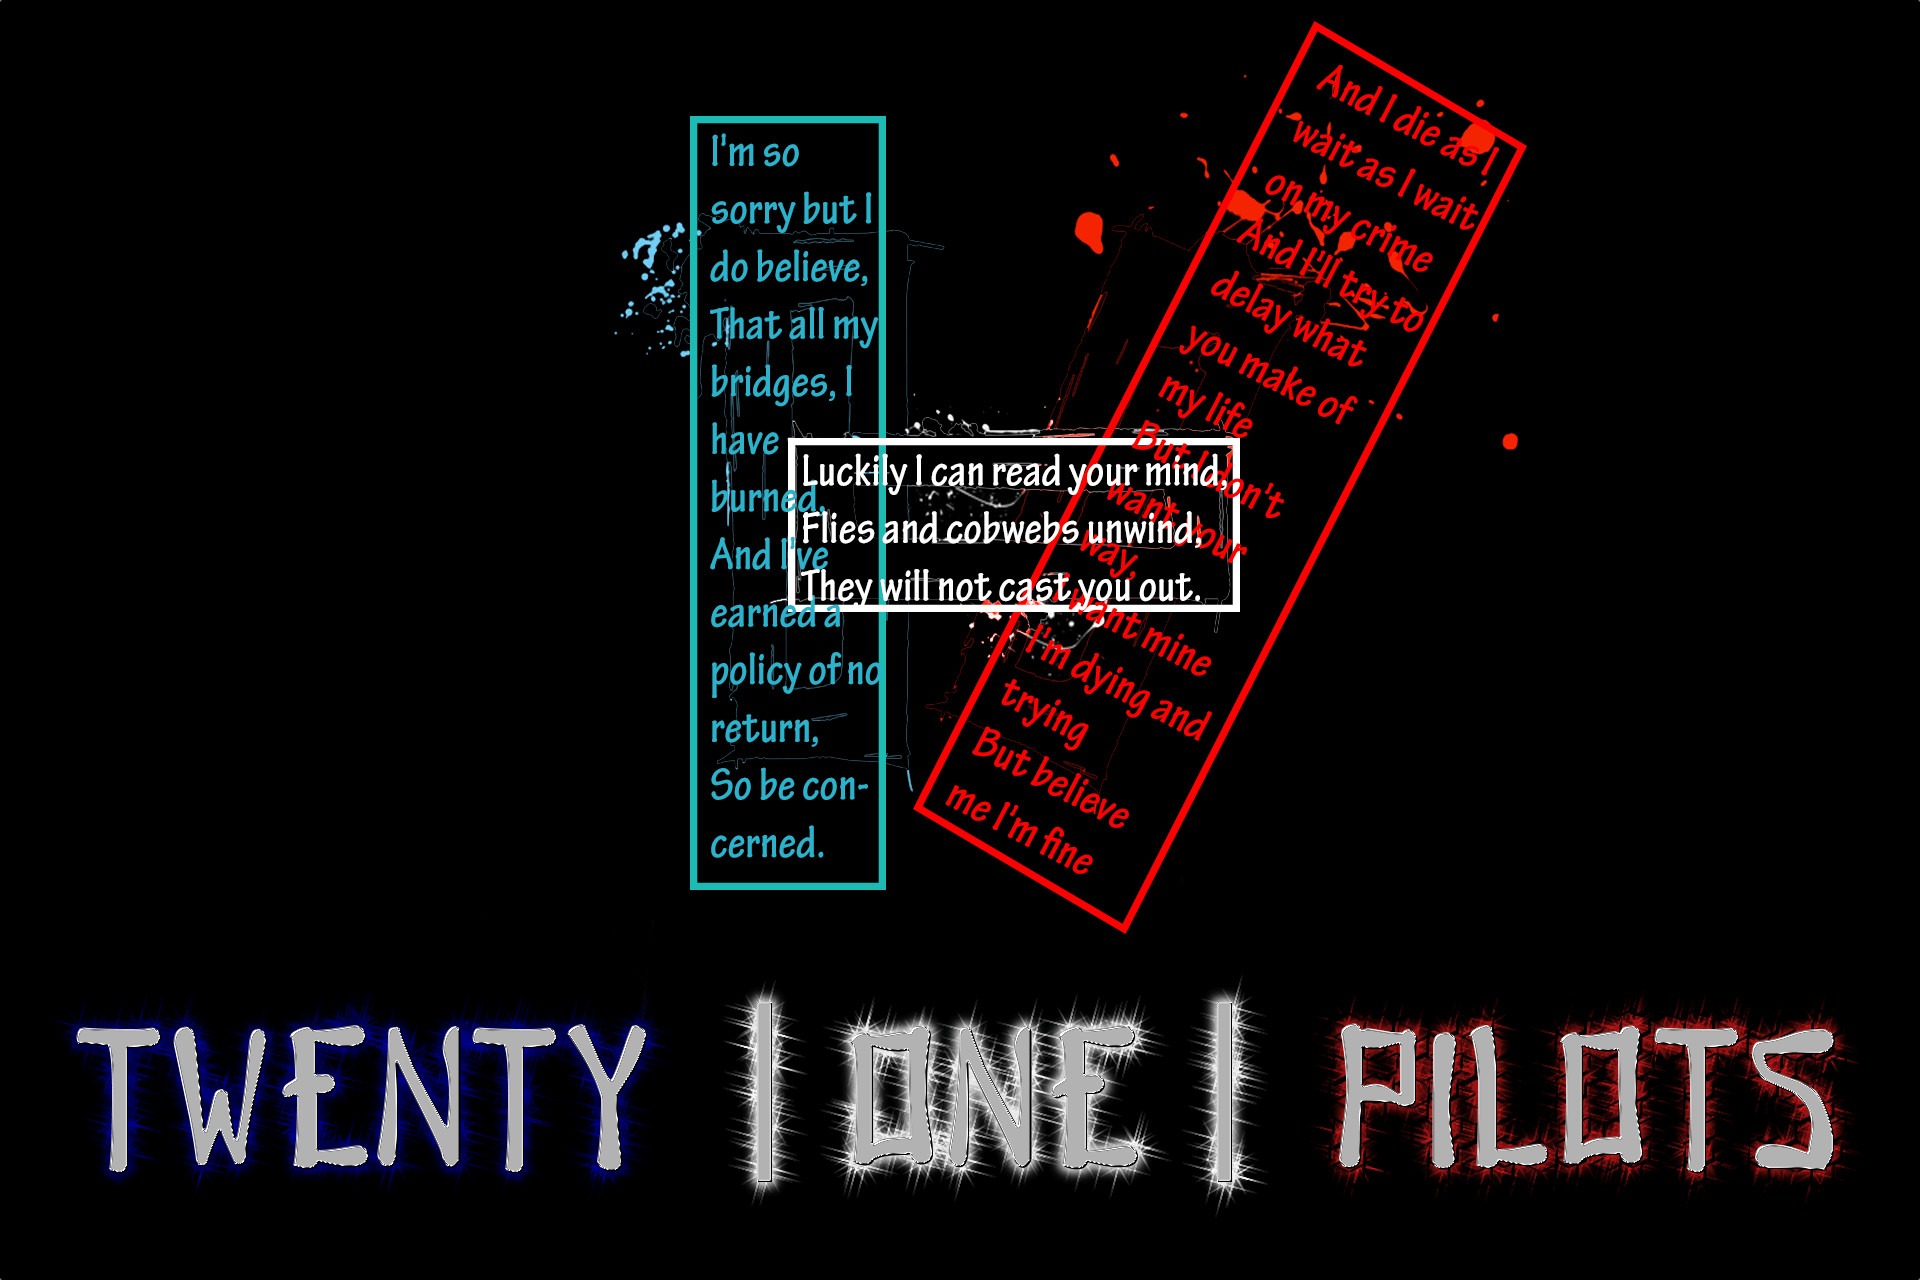 Twenty One Pilots Lyrics Wallpaper – WallpaperSafari